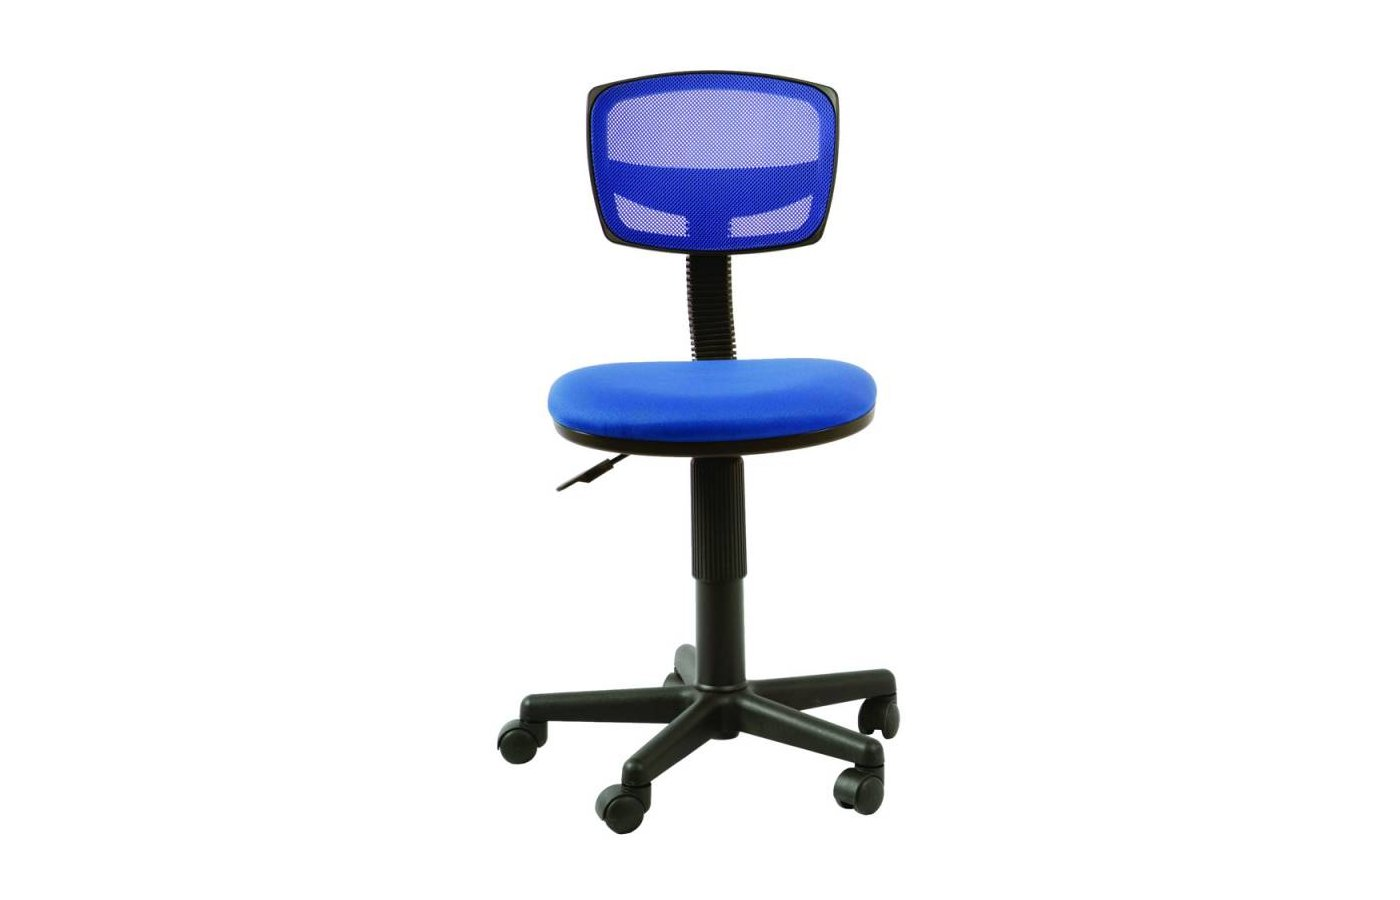 Бюрократ CH-299/BL/15-10 спинка сетка синий сиденье синий 15-10